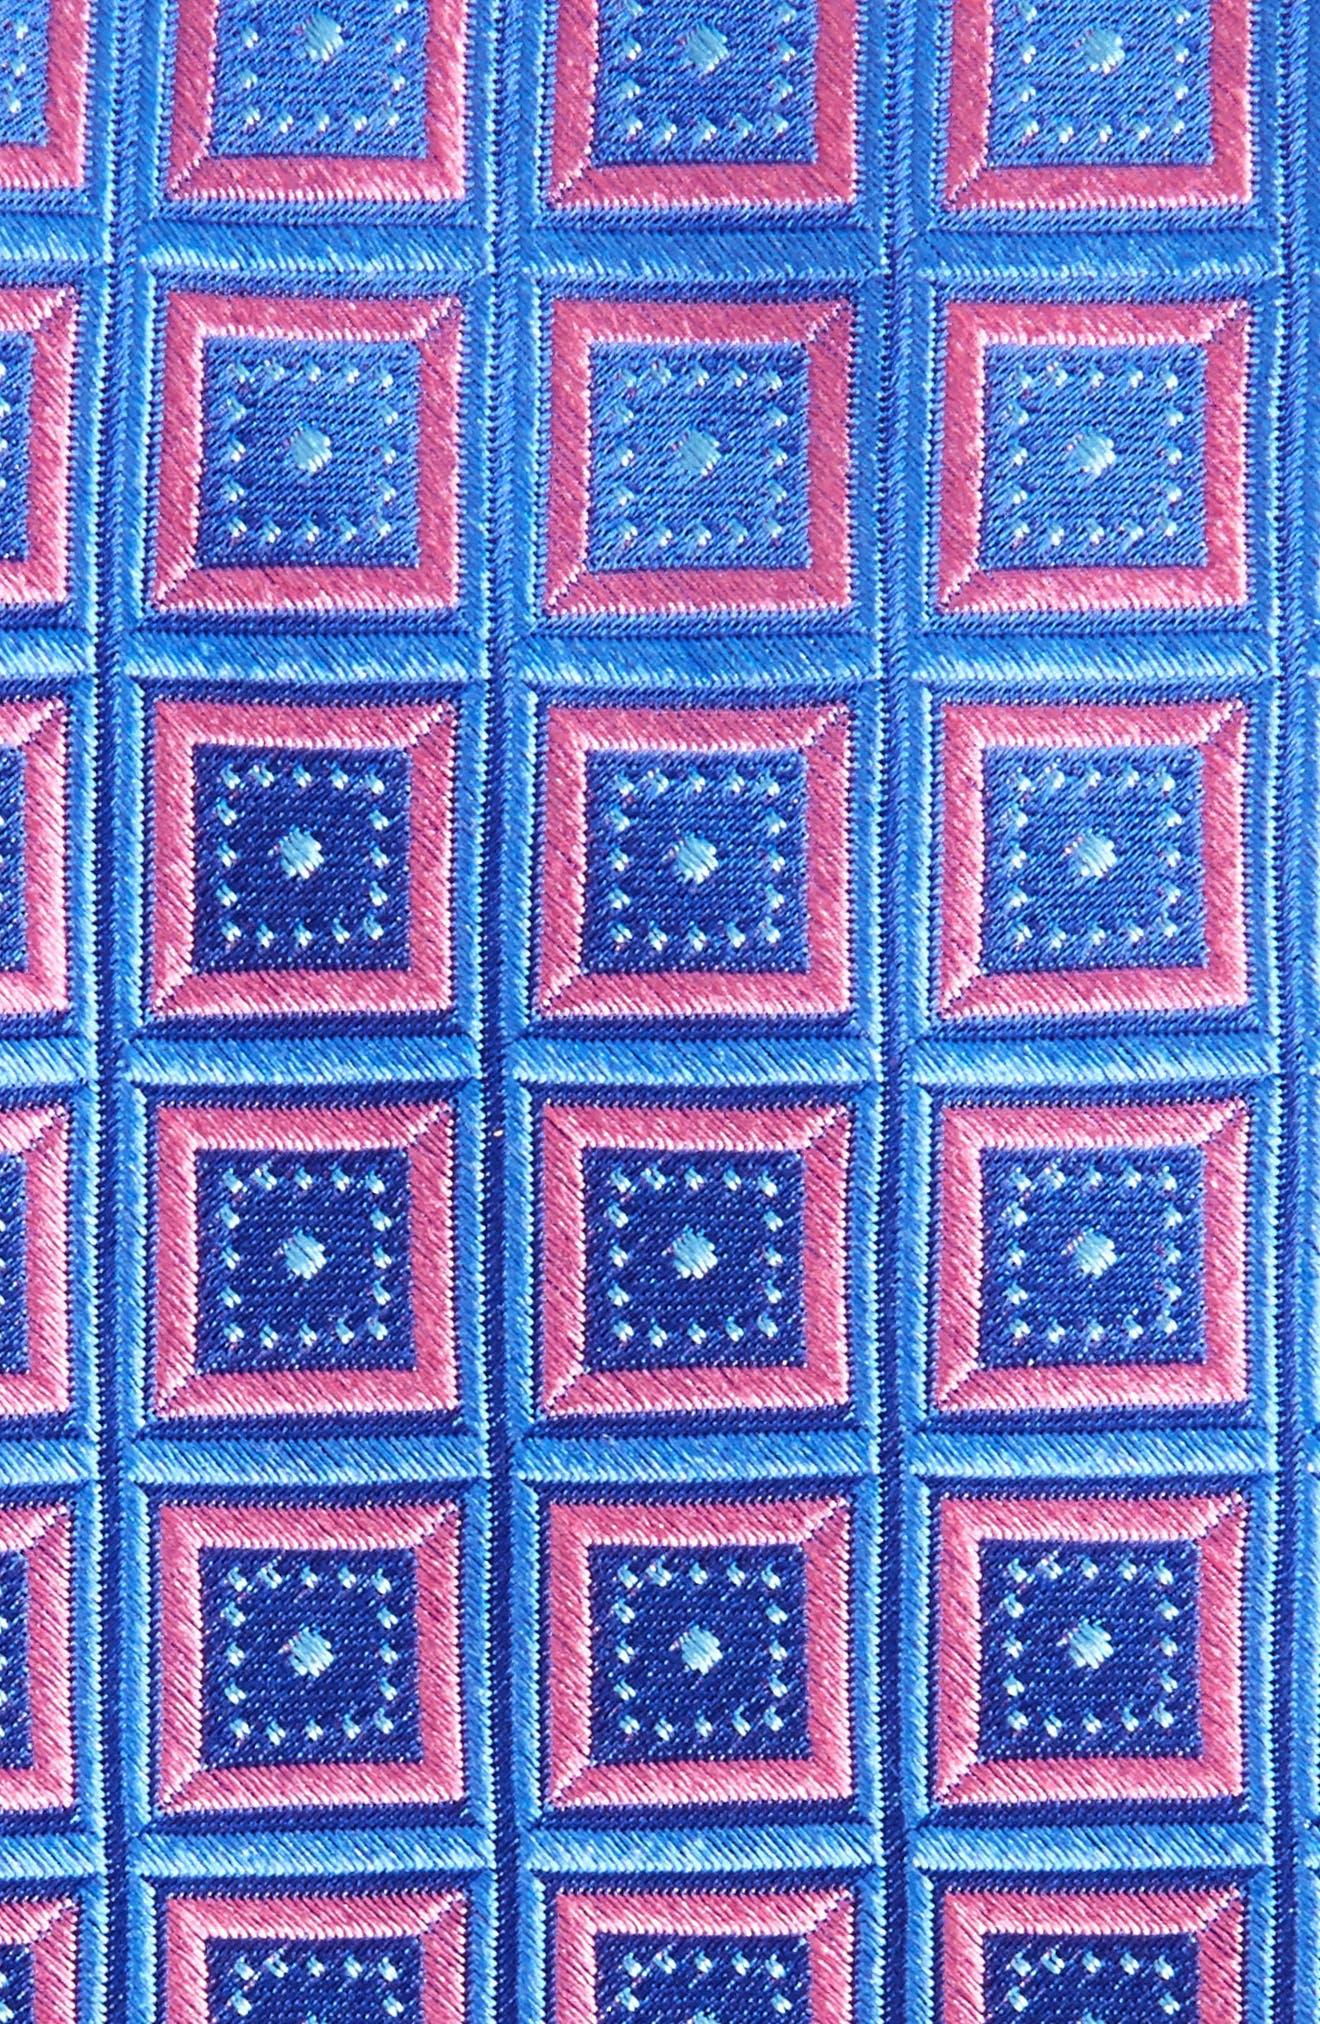 Alternate Image 2  - Nordstrom Men's Shop Sublime Squares Geometric Silk Tie